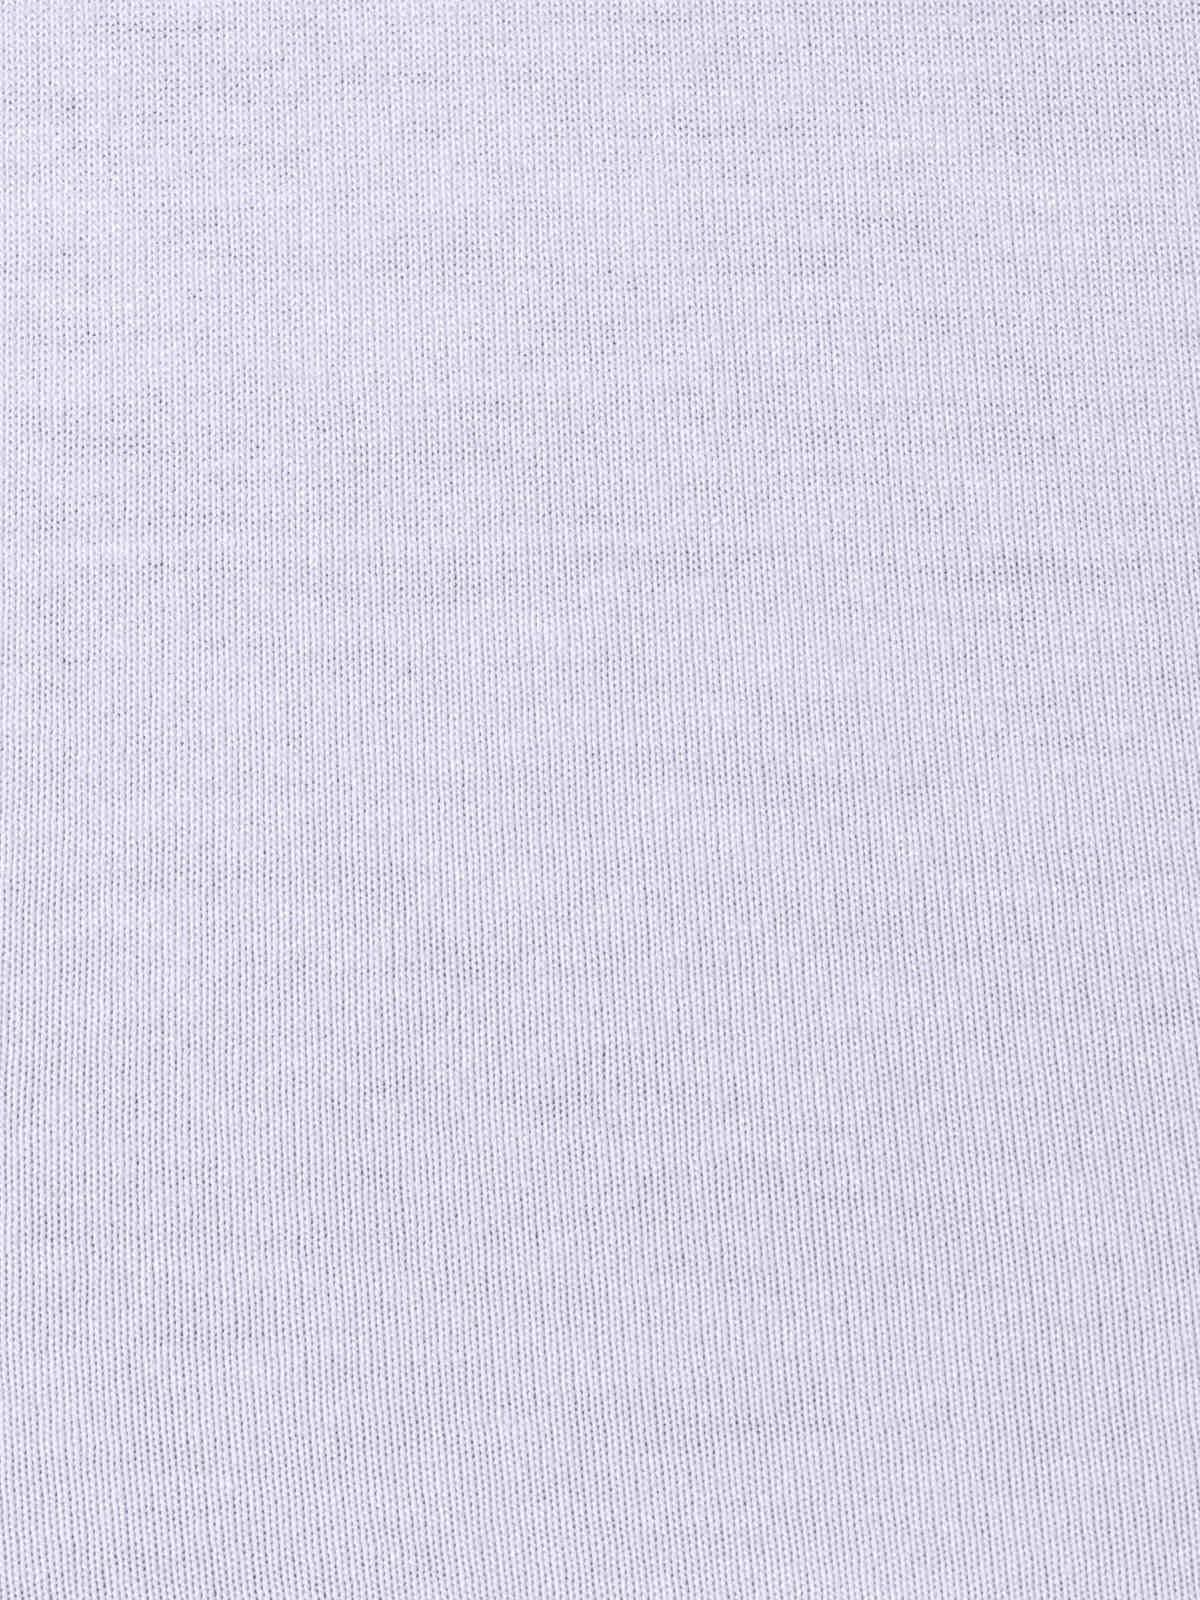 Camiseta mujer tirante ancho Blanco